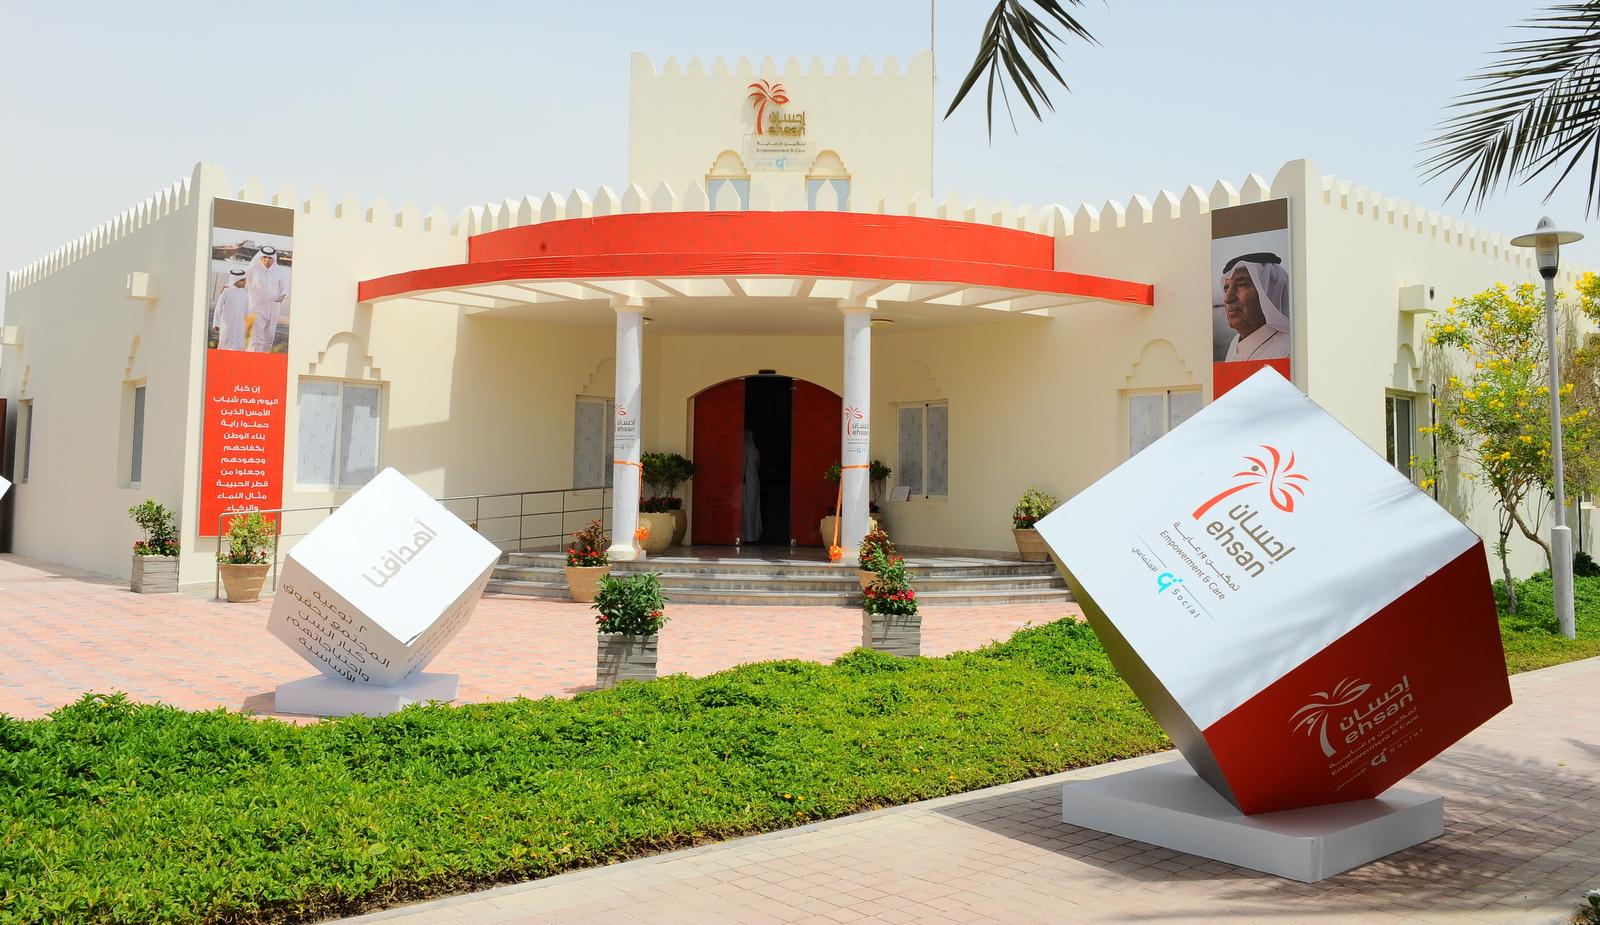 Ehsan Club (Centre for Elderly Empowerment & Care - Ehsan) - Age-Friendly World